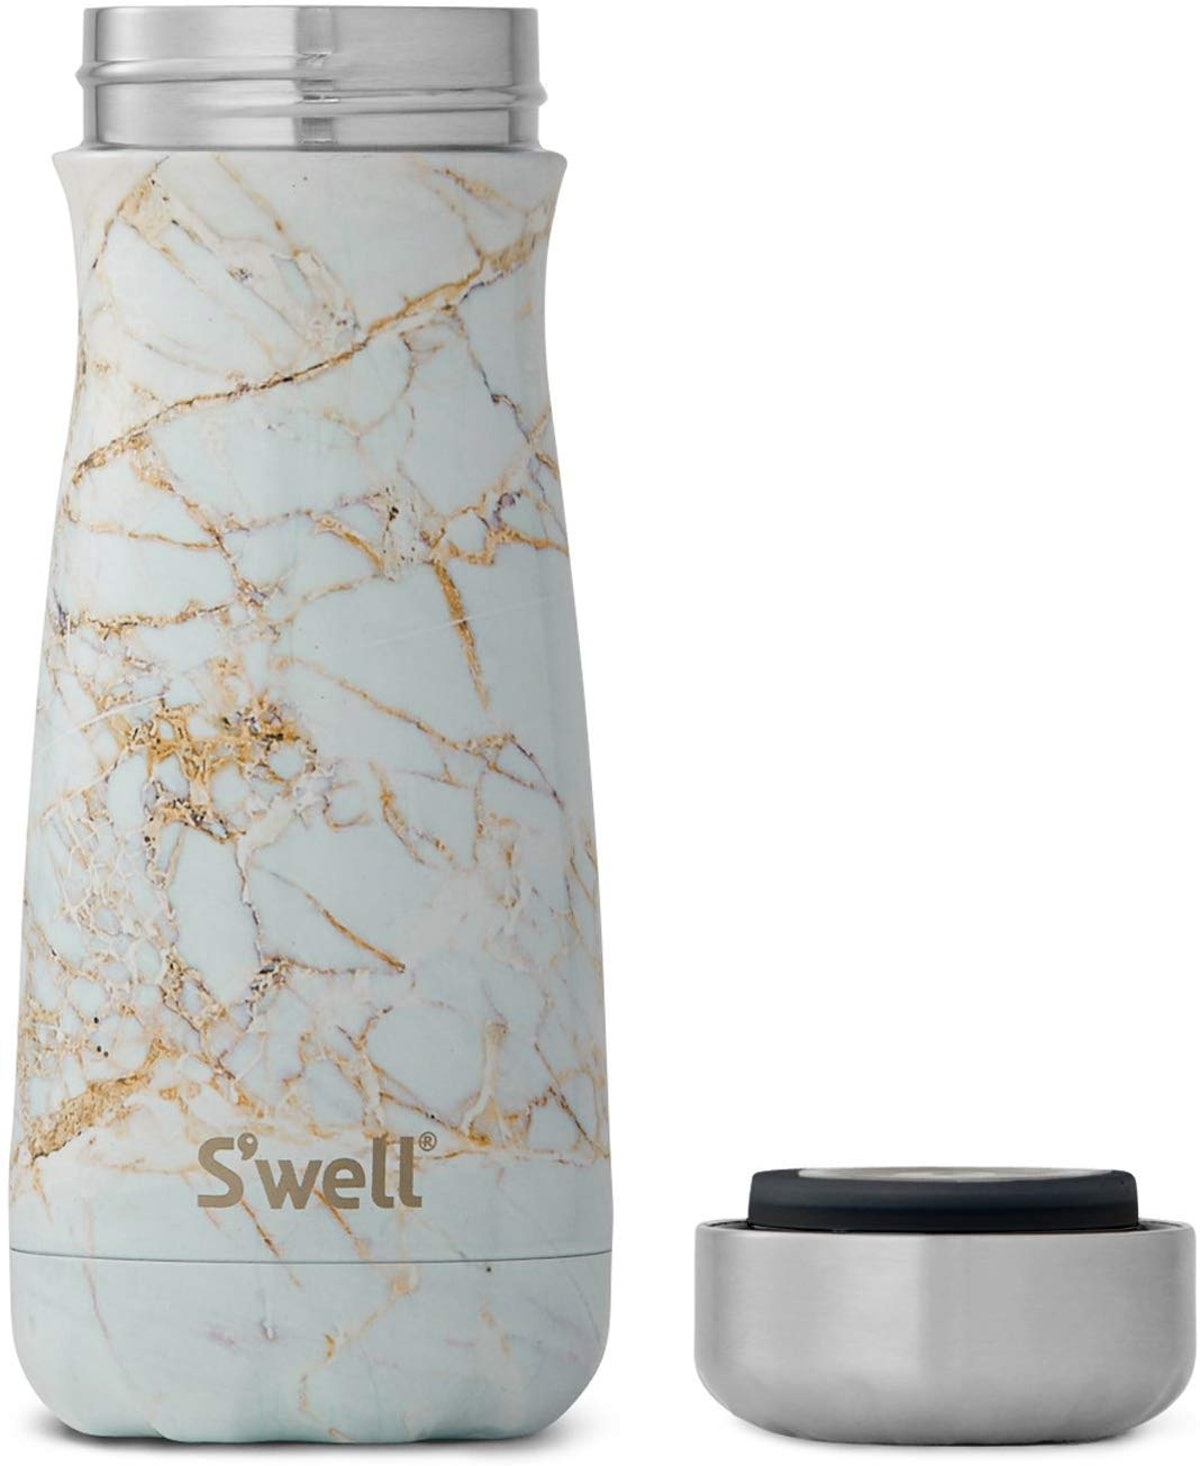 S'well  Stainless Steel Travel Mug